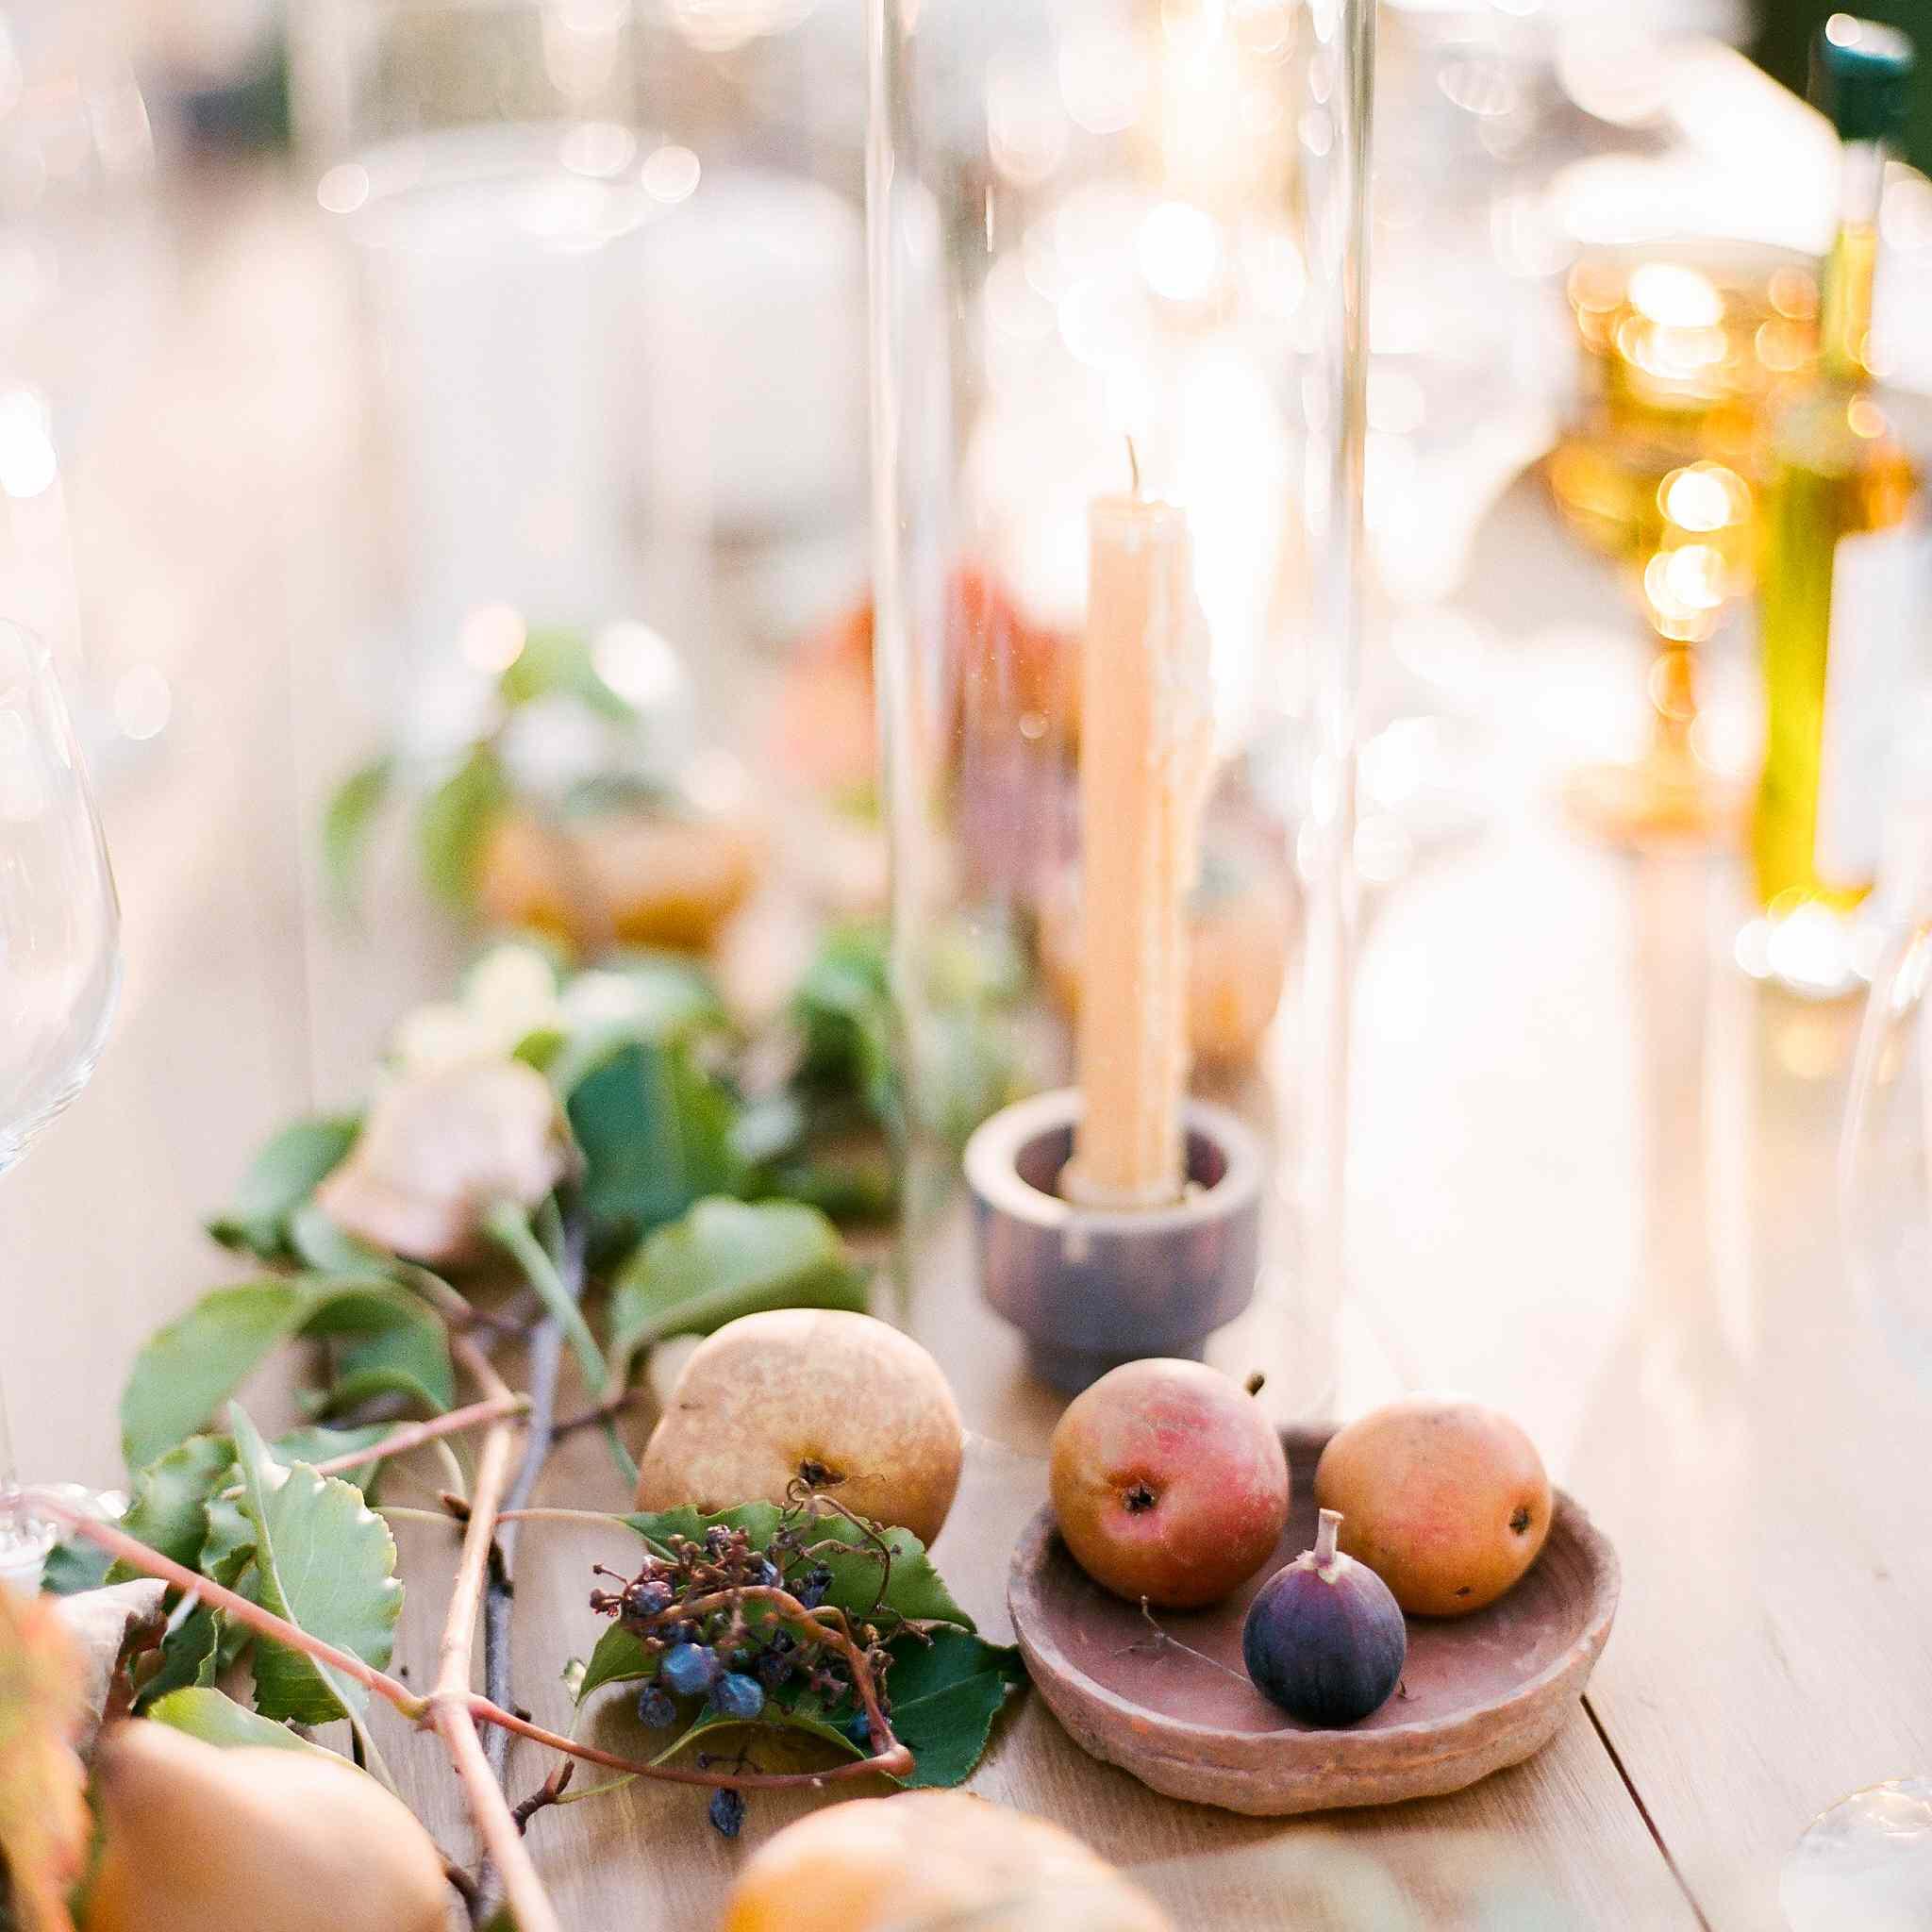 Fruit table décor